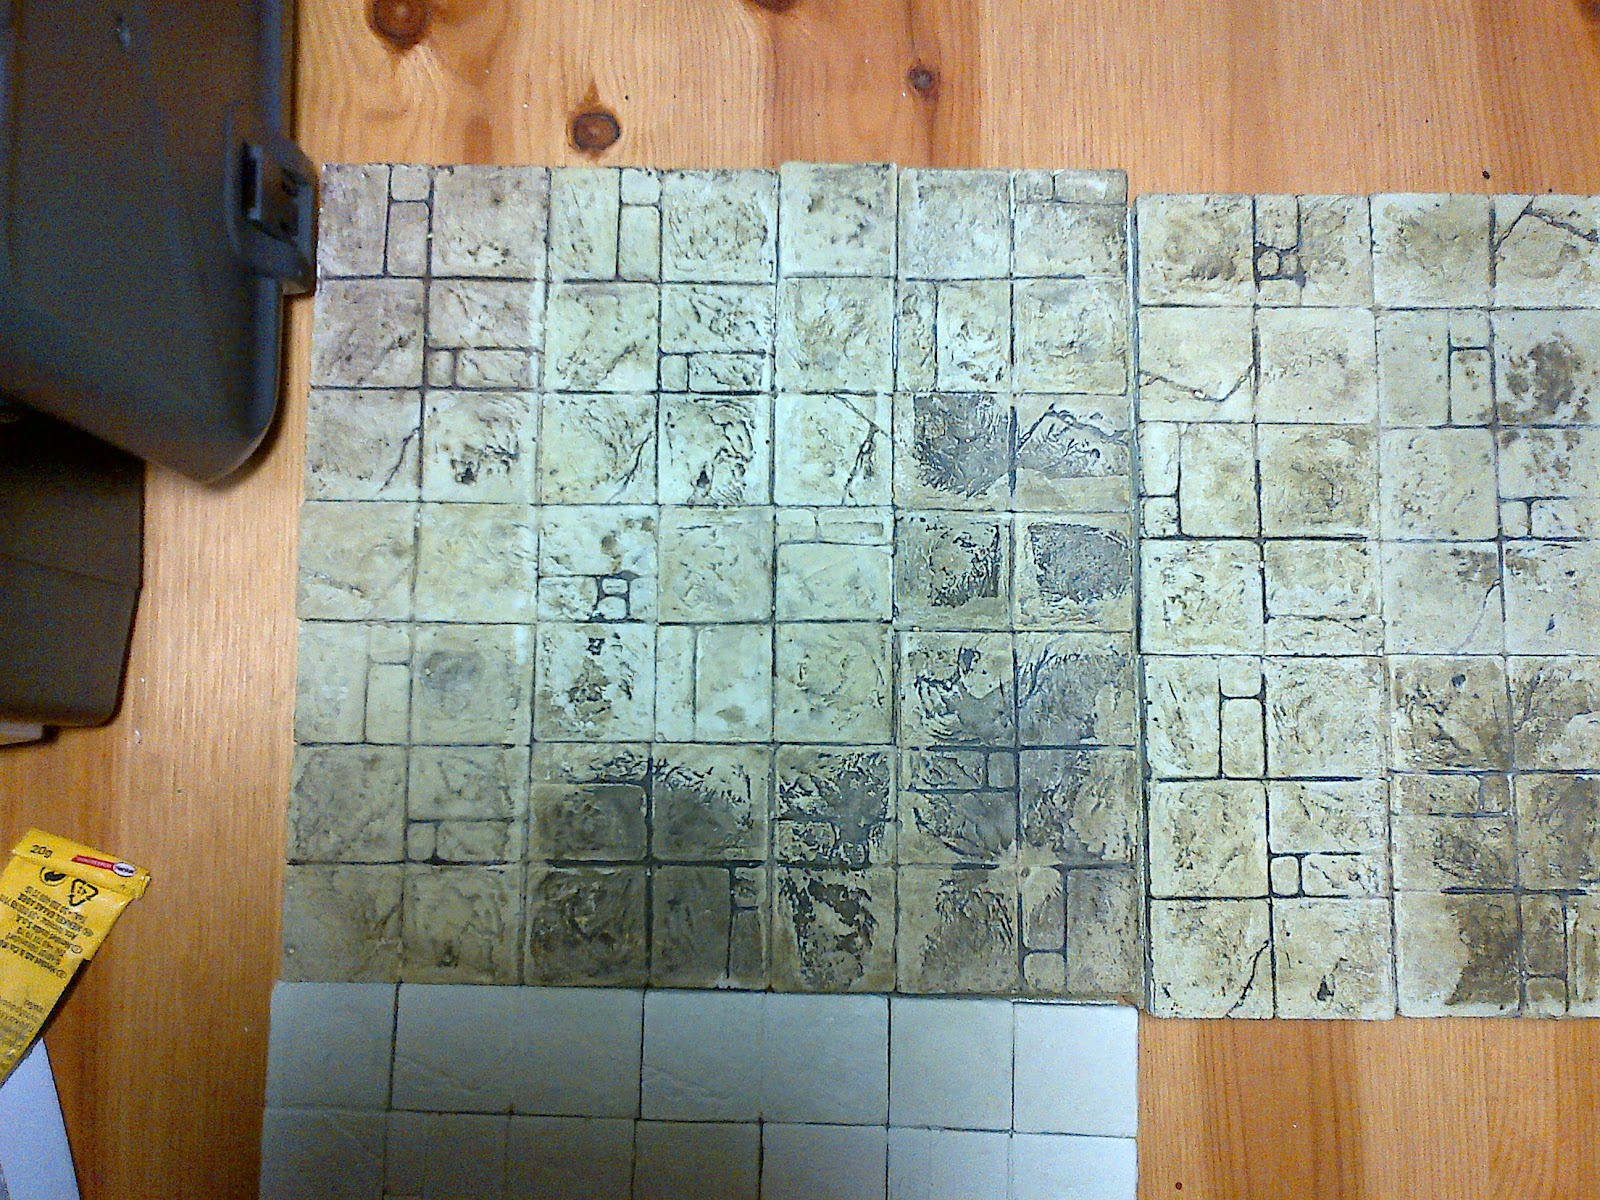 Fako to faktory: dungeon modulare: master delle piastrelle